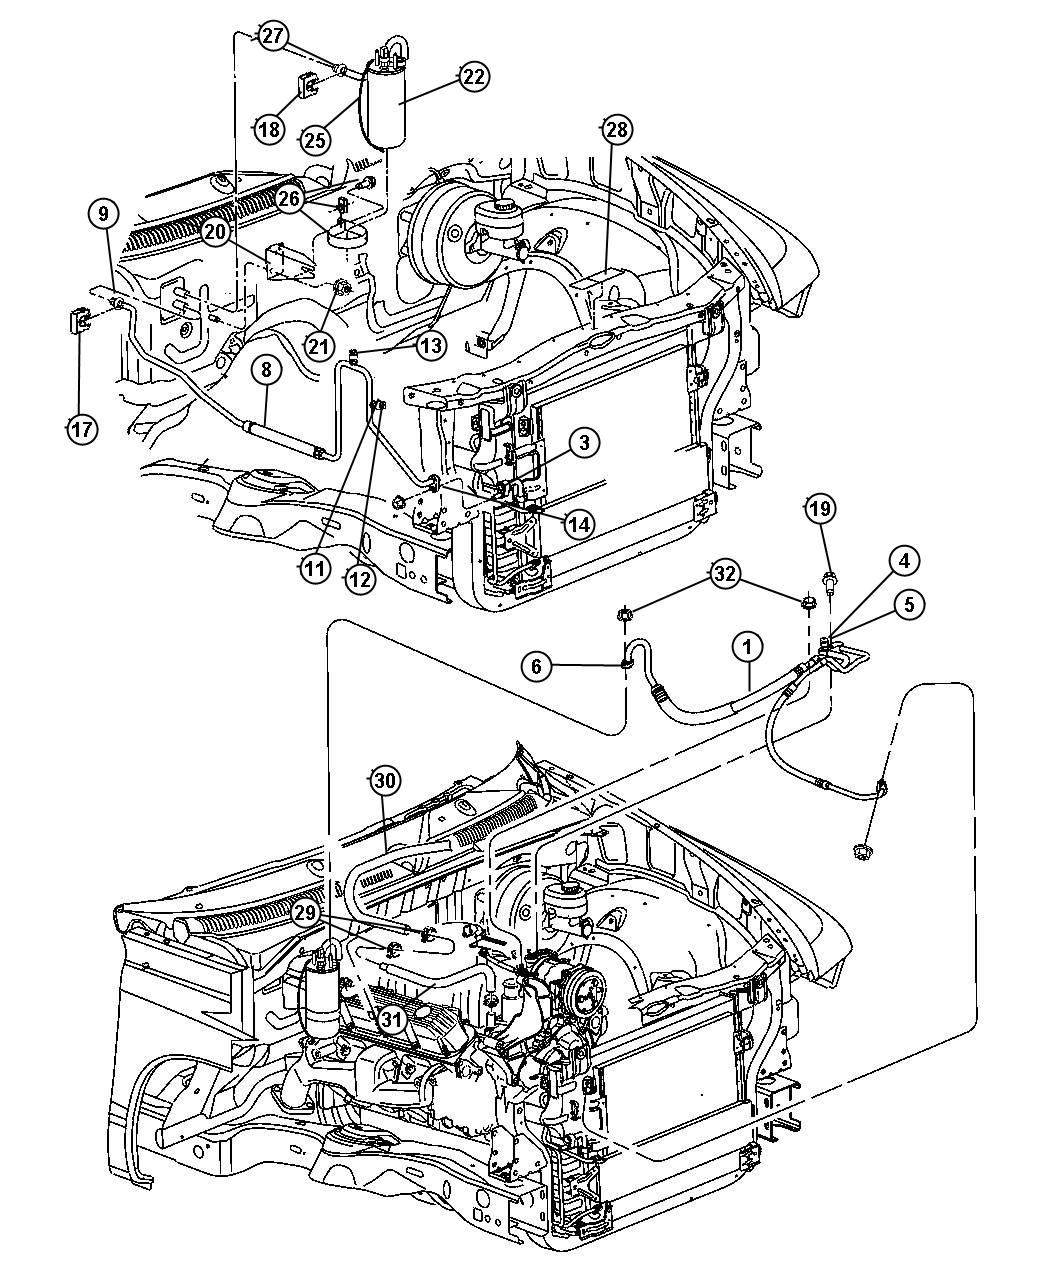 Dodge Ram 2500 Line. A/c liquid. Without [mechanical